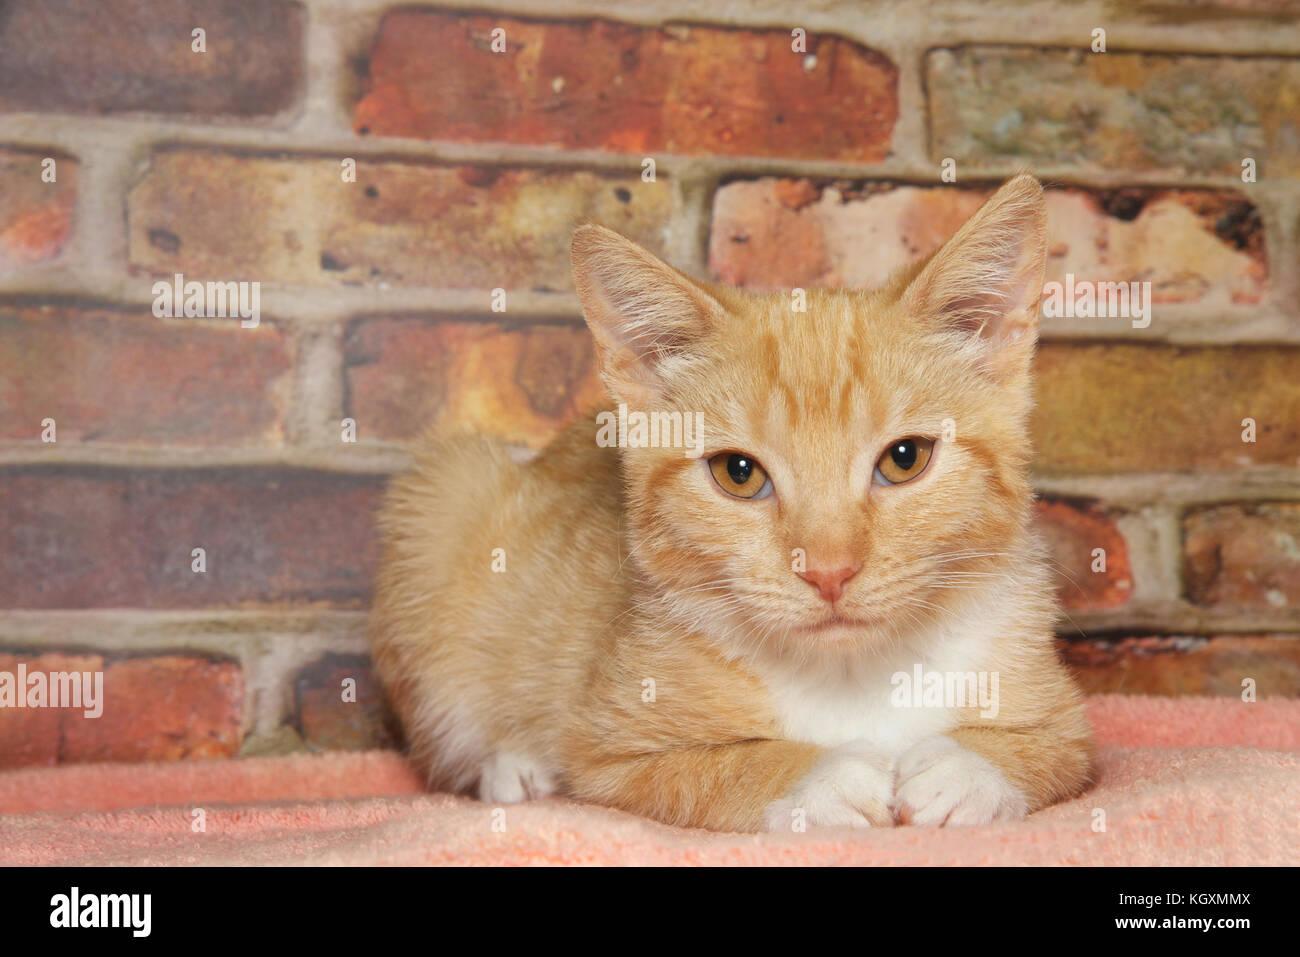 Portrait of one orange and white stripped ginger tabby kitten